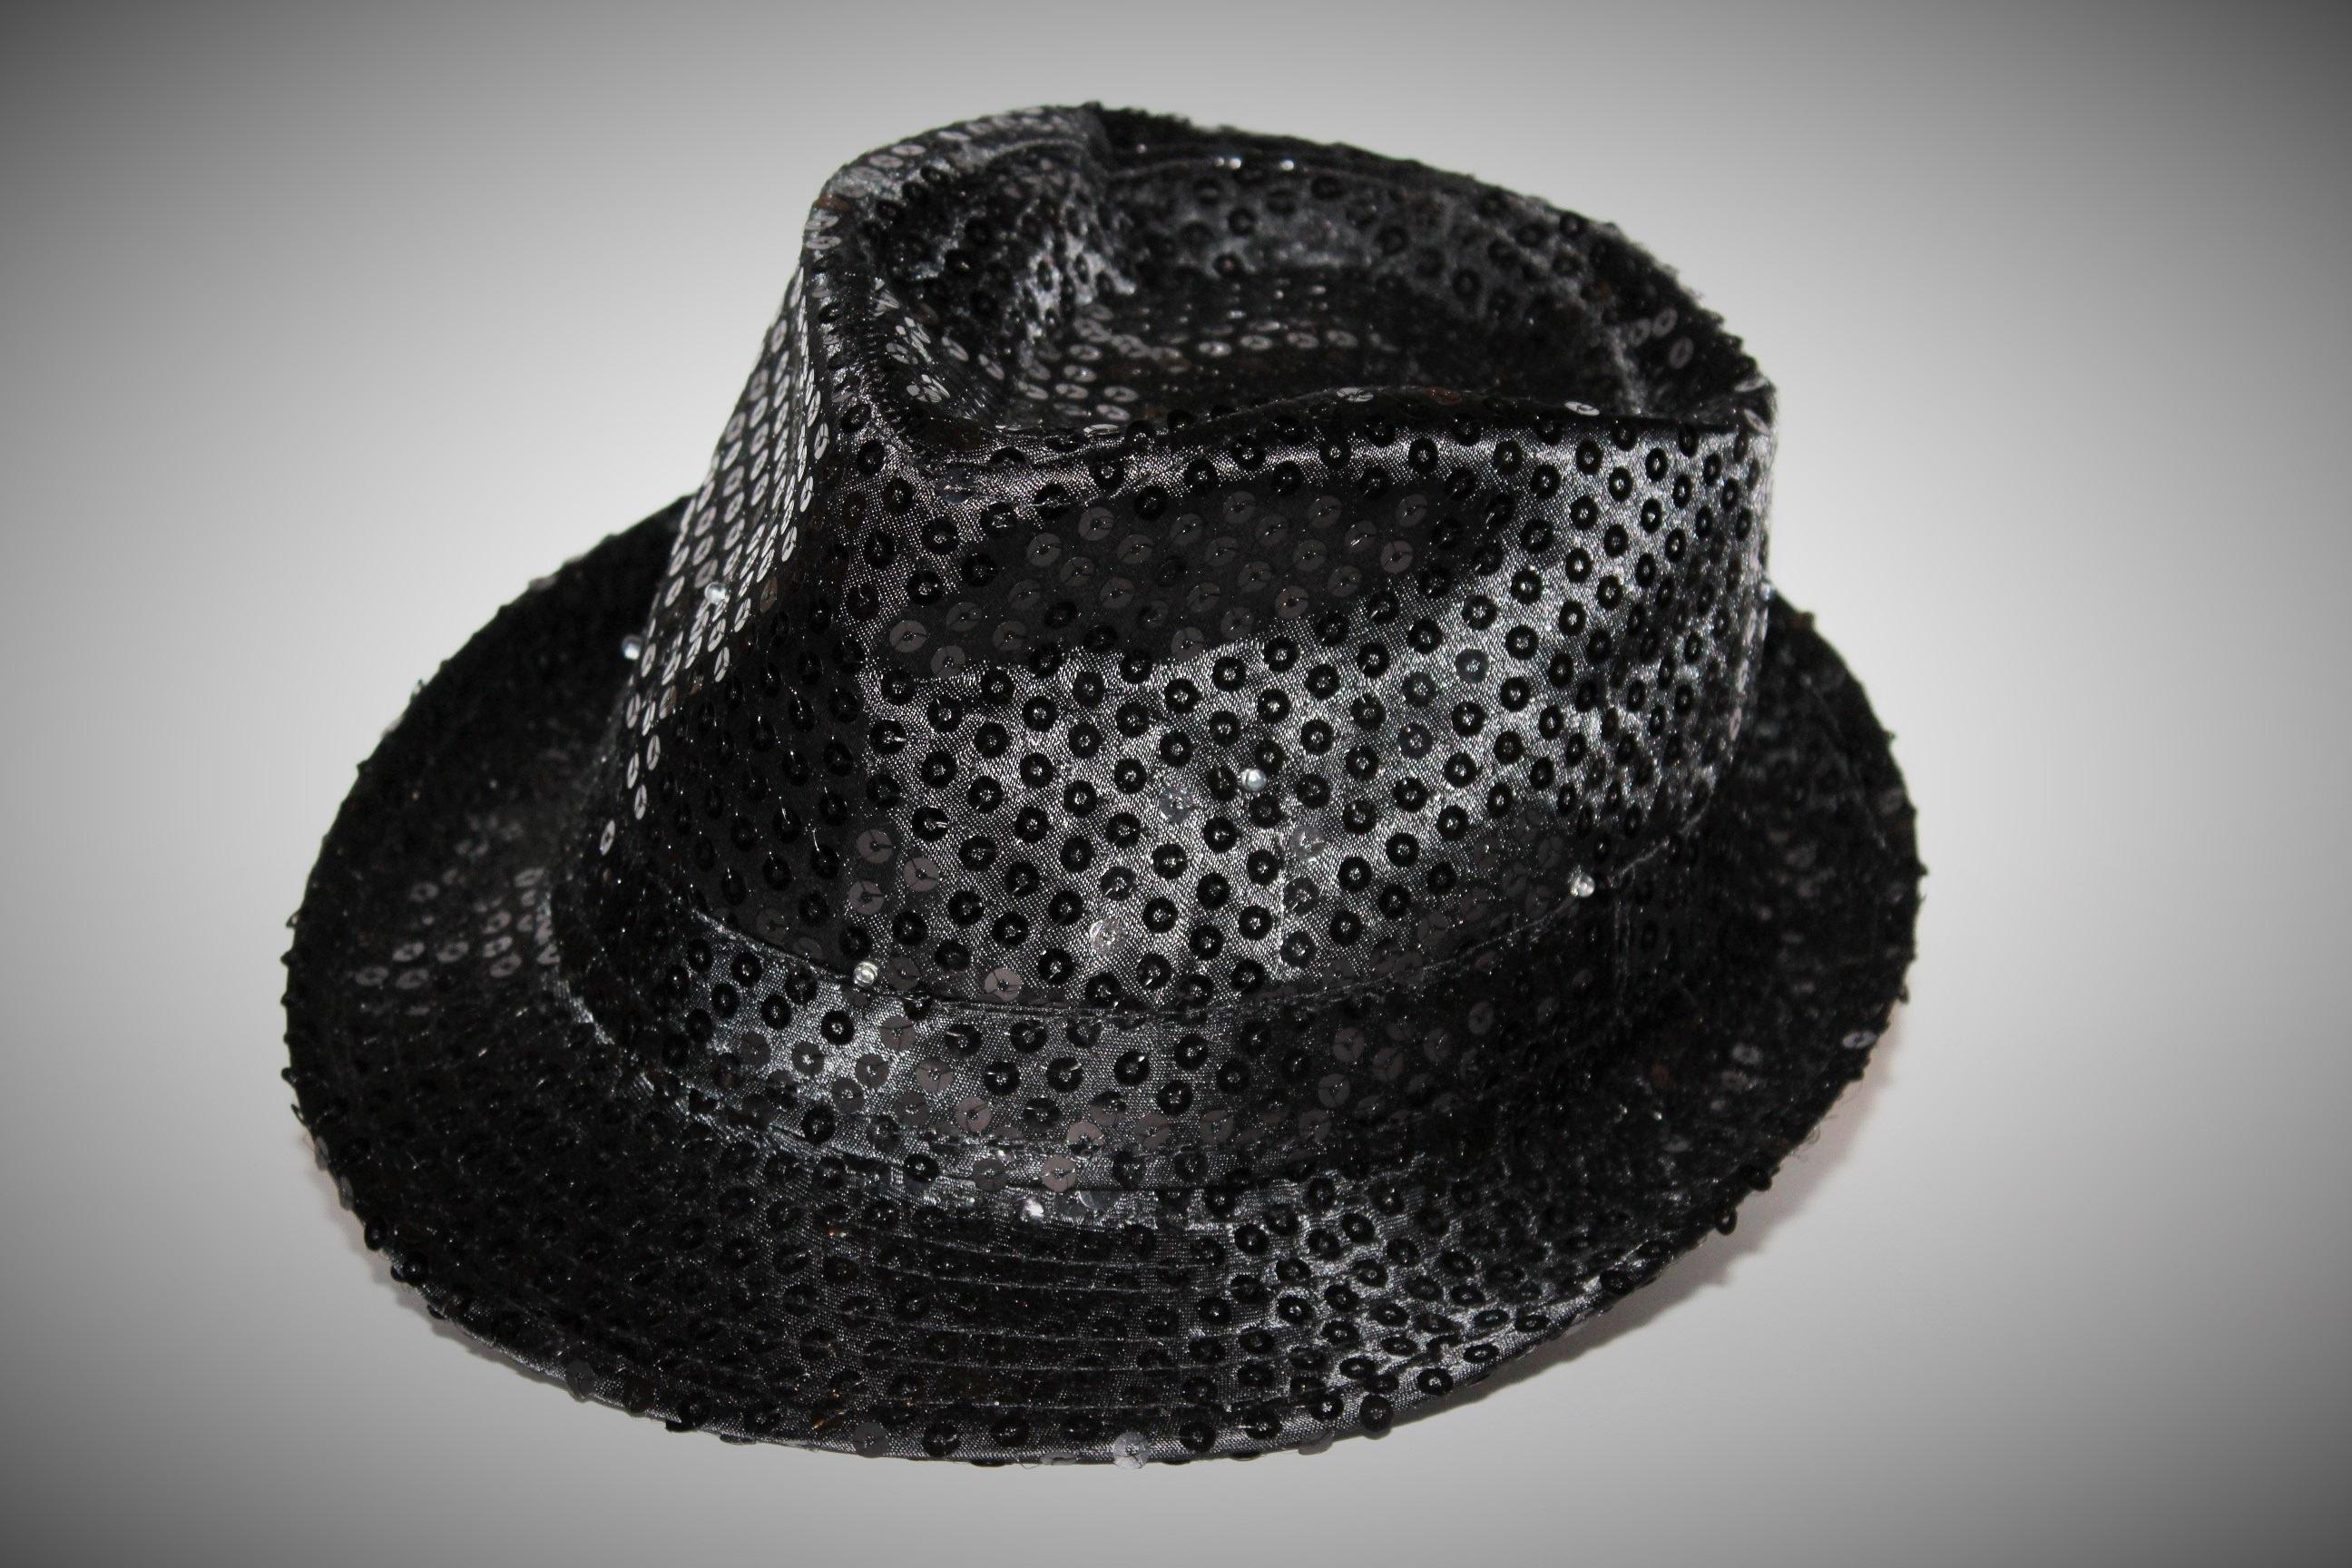 en blanco y negro carnaval sombrero ropa negro Casco gorra bonita  Sombrerería Fedora Lentejuelas sombrero de 6504ee3a0b2